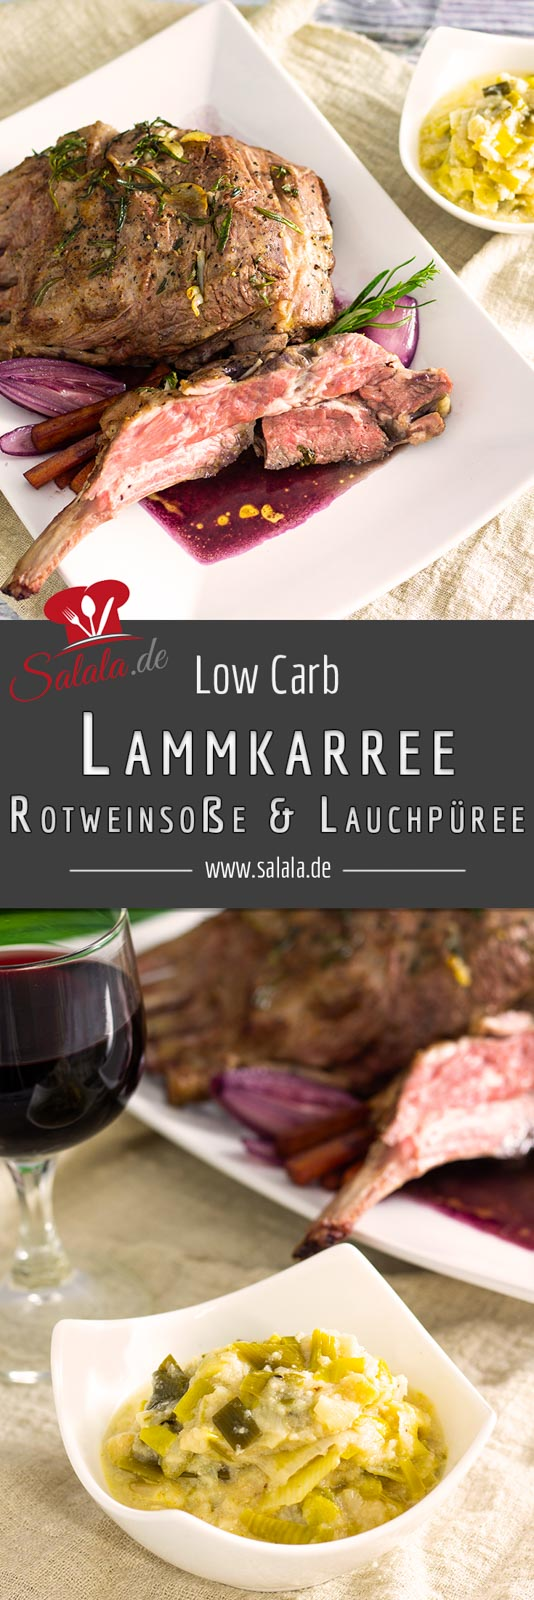 #Lammkarree #Lauchpüree #lowcarb #lowcarbrezepte #osterrezpte #rezpetemitlamm #rezeptemitlauch #rezeptemitblumenkohl #lamminrotweinsauce #lowcarbkochen